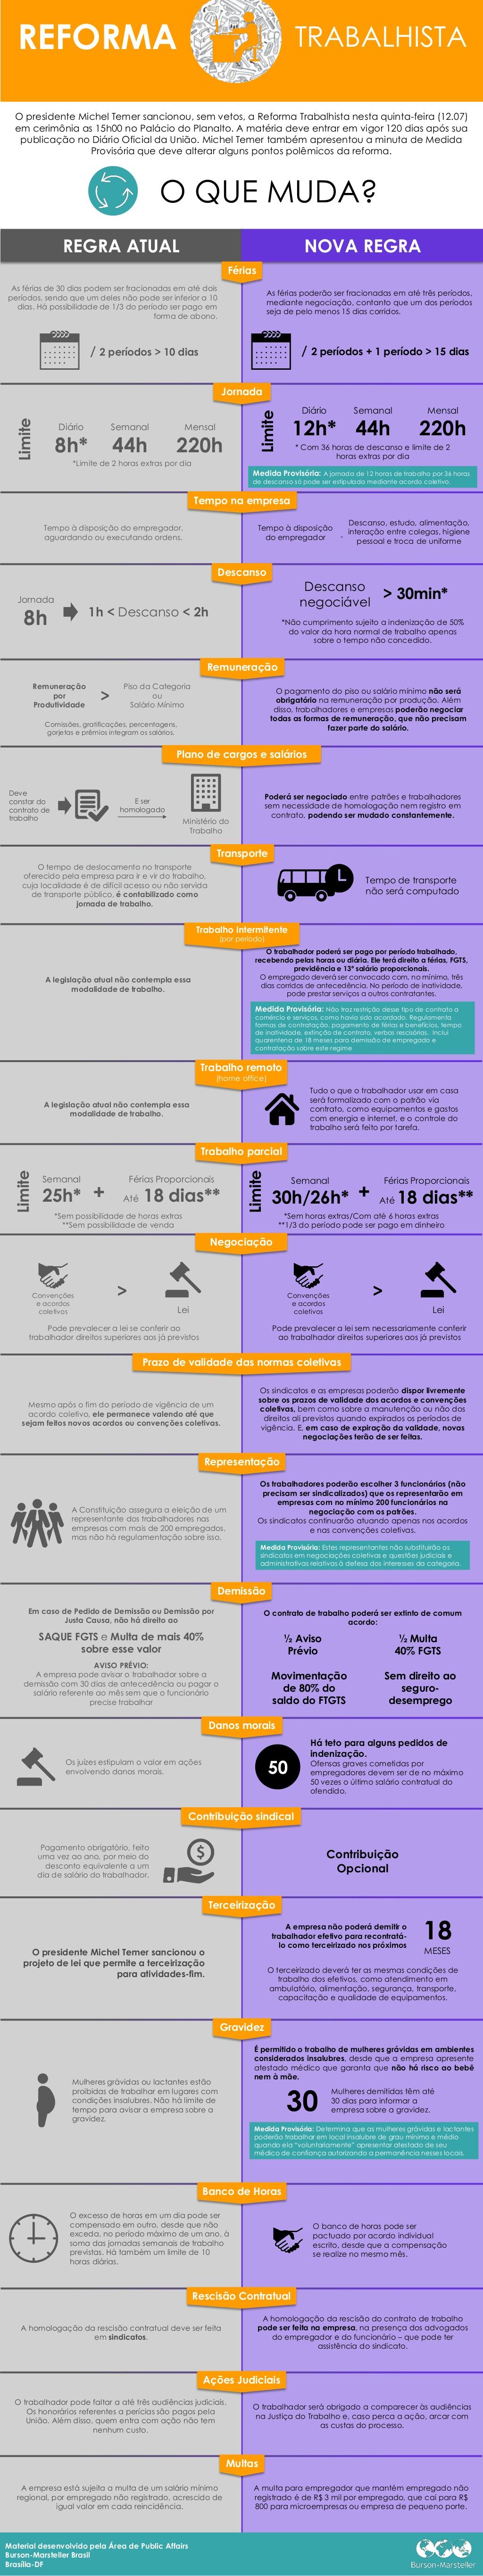 Infográfico Reforma Trabalhista